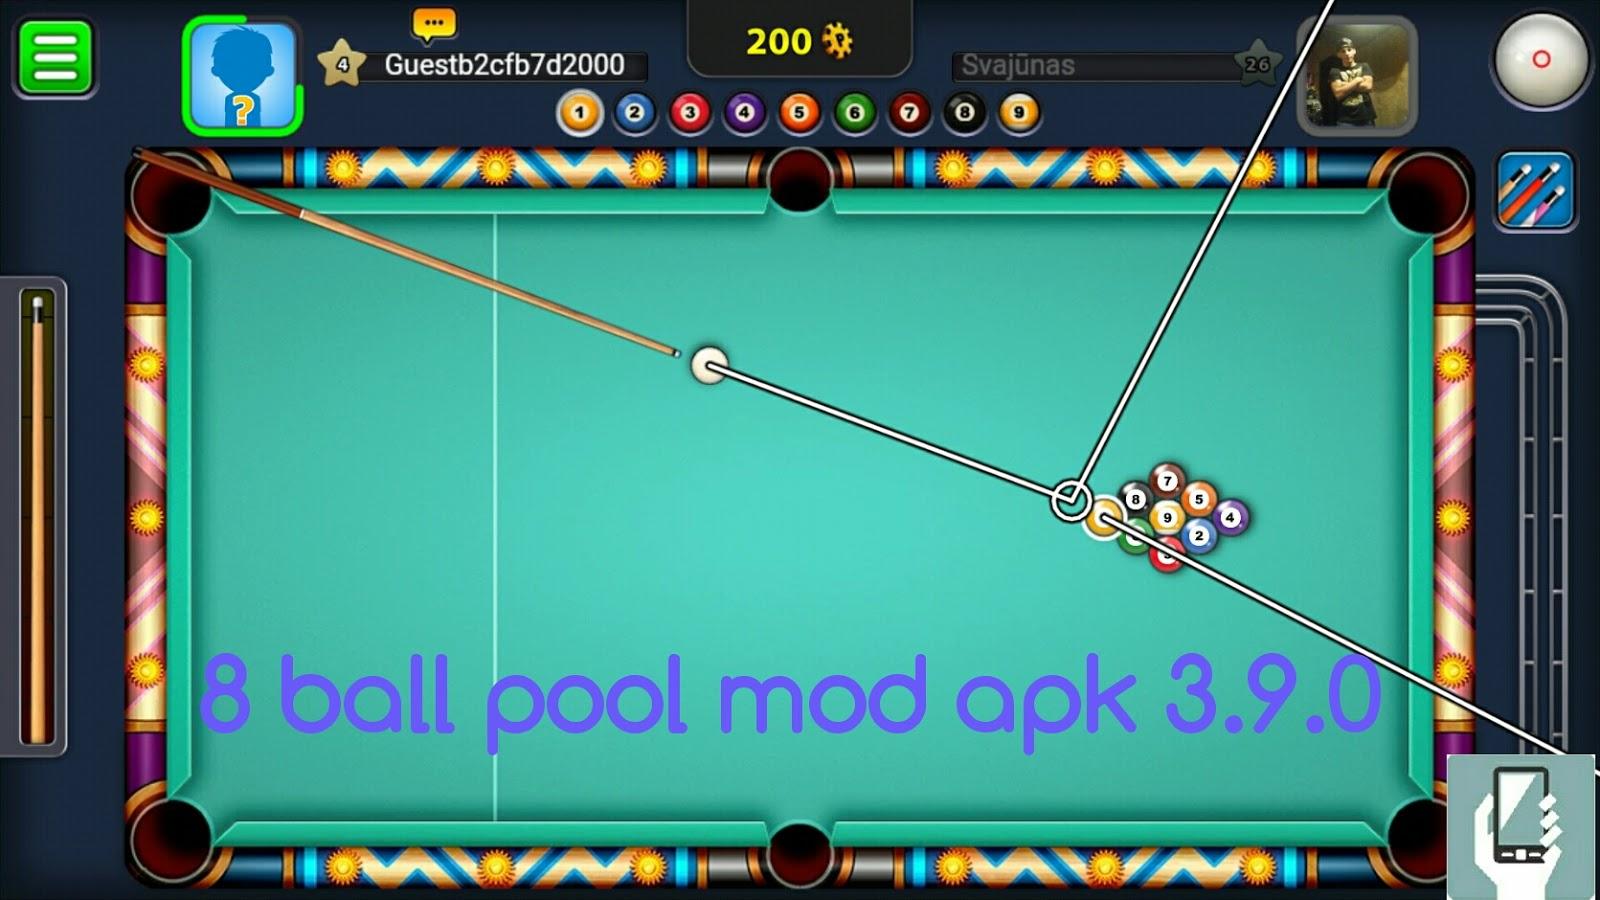 8 ball pool 390 mod apk techno junction 8 ball pool 390 mod apk stopboris Gallery